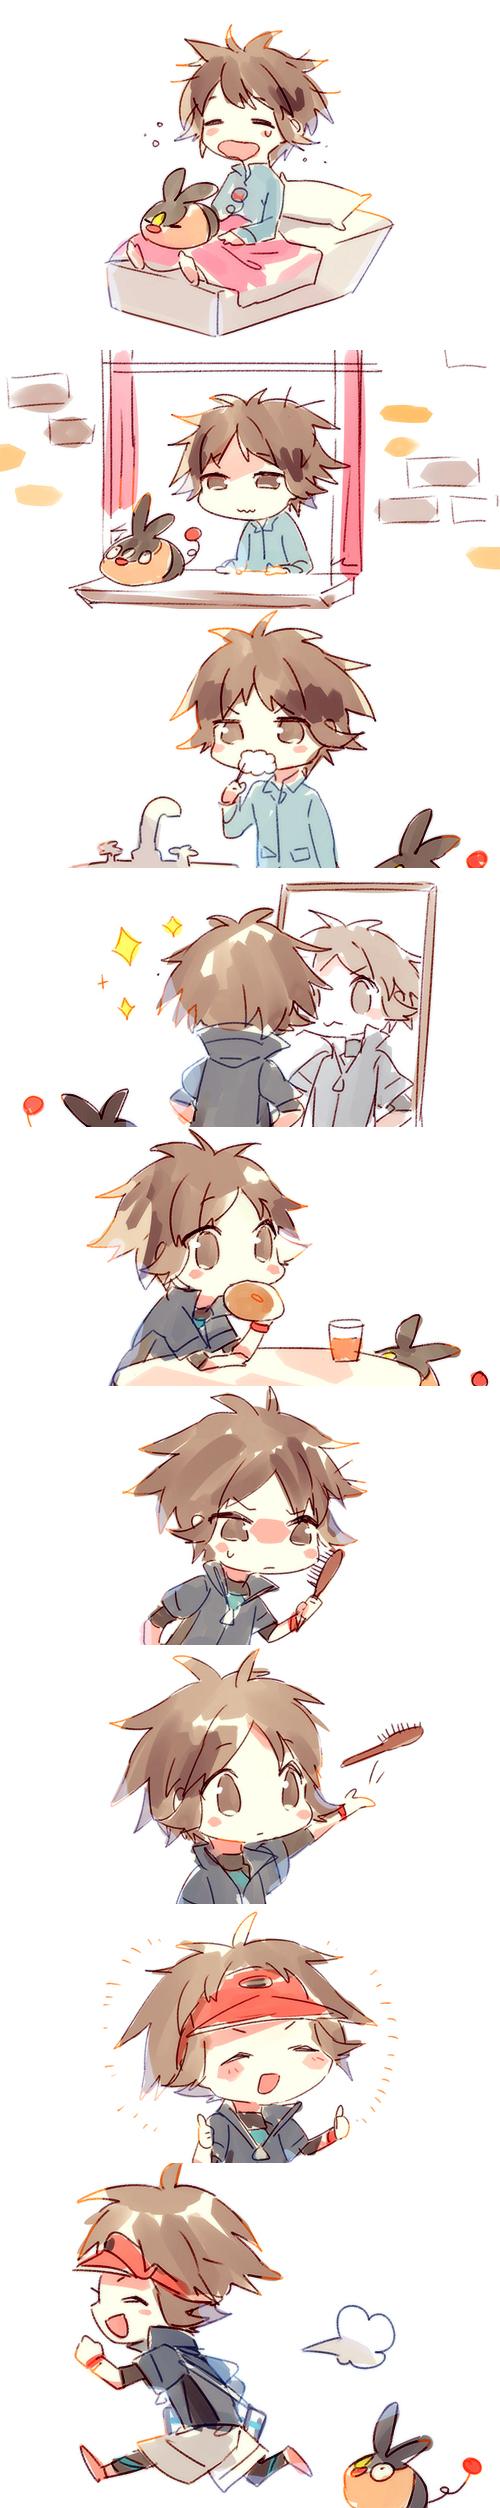 Tags: Anime, Namie-kun, Pokémon, Kyouhei, Tepig, Breakfast, Brush, Morning, Toothbrushing